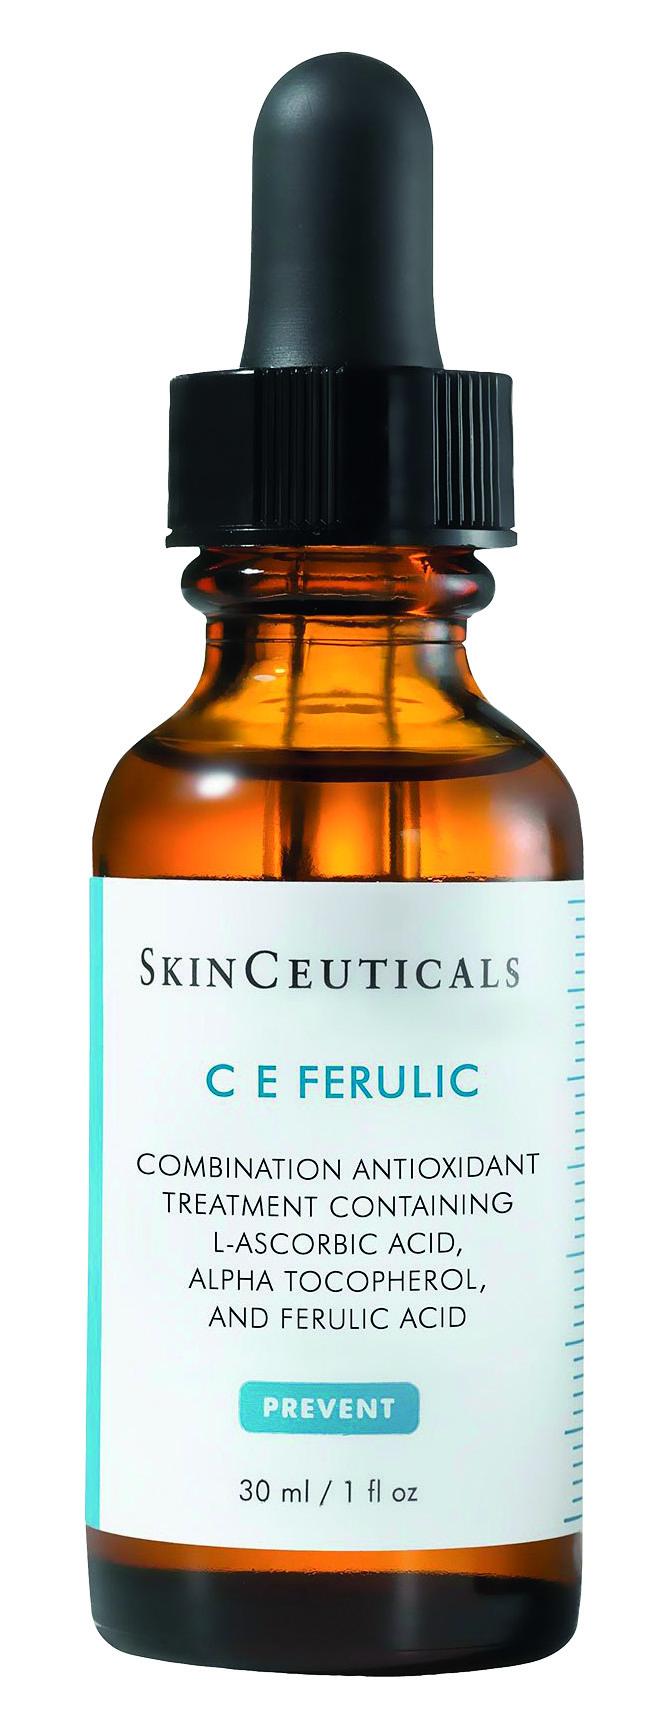 C E Ferrulic serum SkinCeuticals.